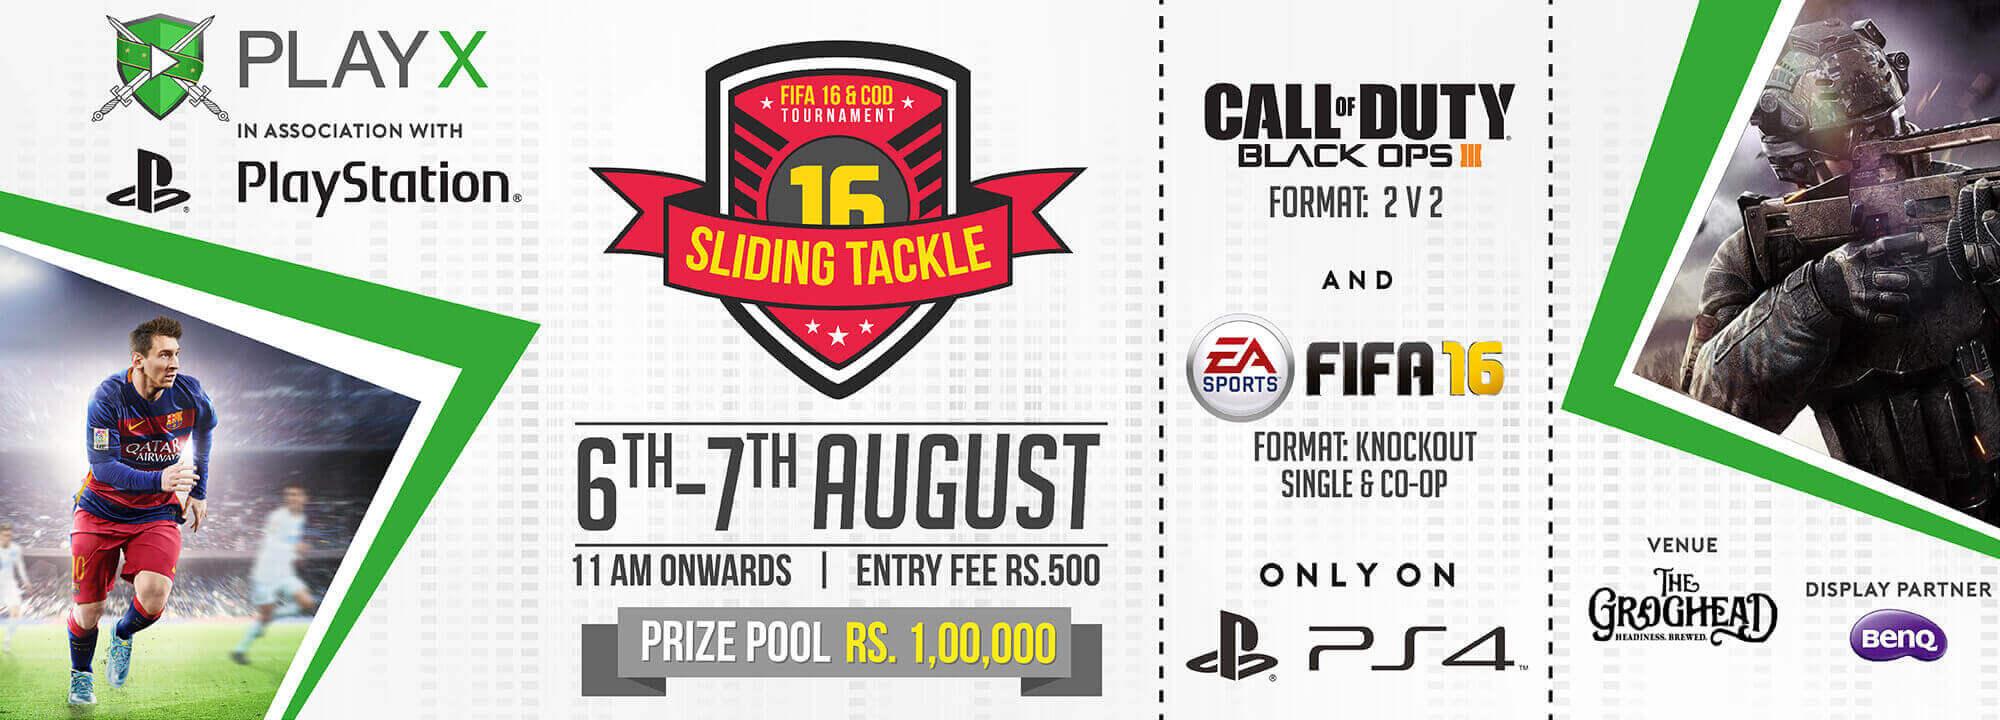 Offline gaming tournament PlayX